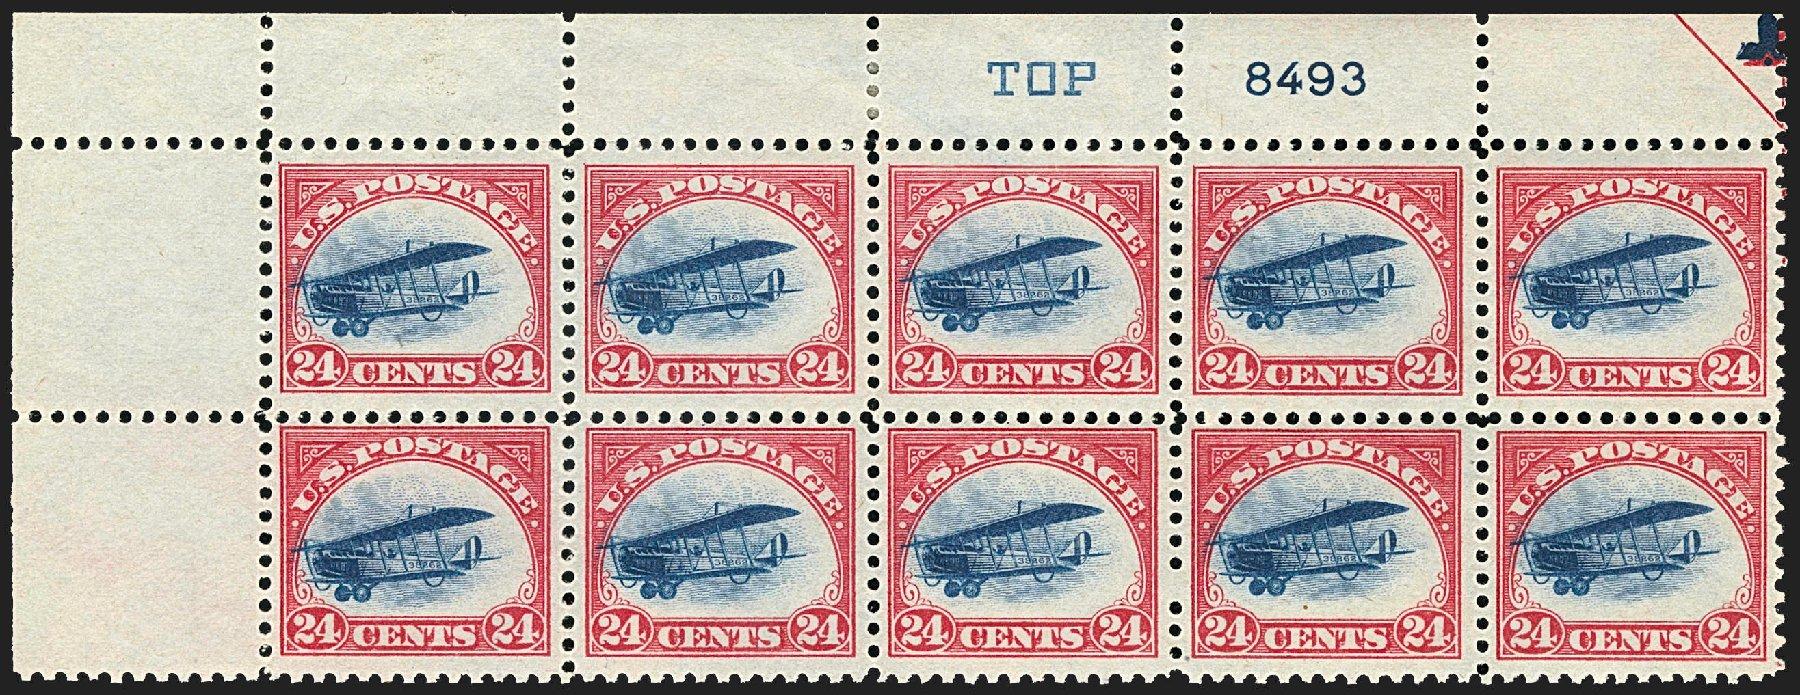 Cost of US Stamps Scott C3 - 1918 24c Air Curtiss Jenny. Robert Siegel Auction Galleries, Jul 2015, Sale 1107, Lot 567